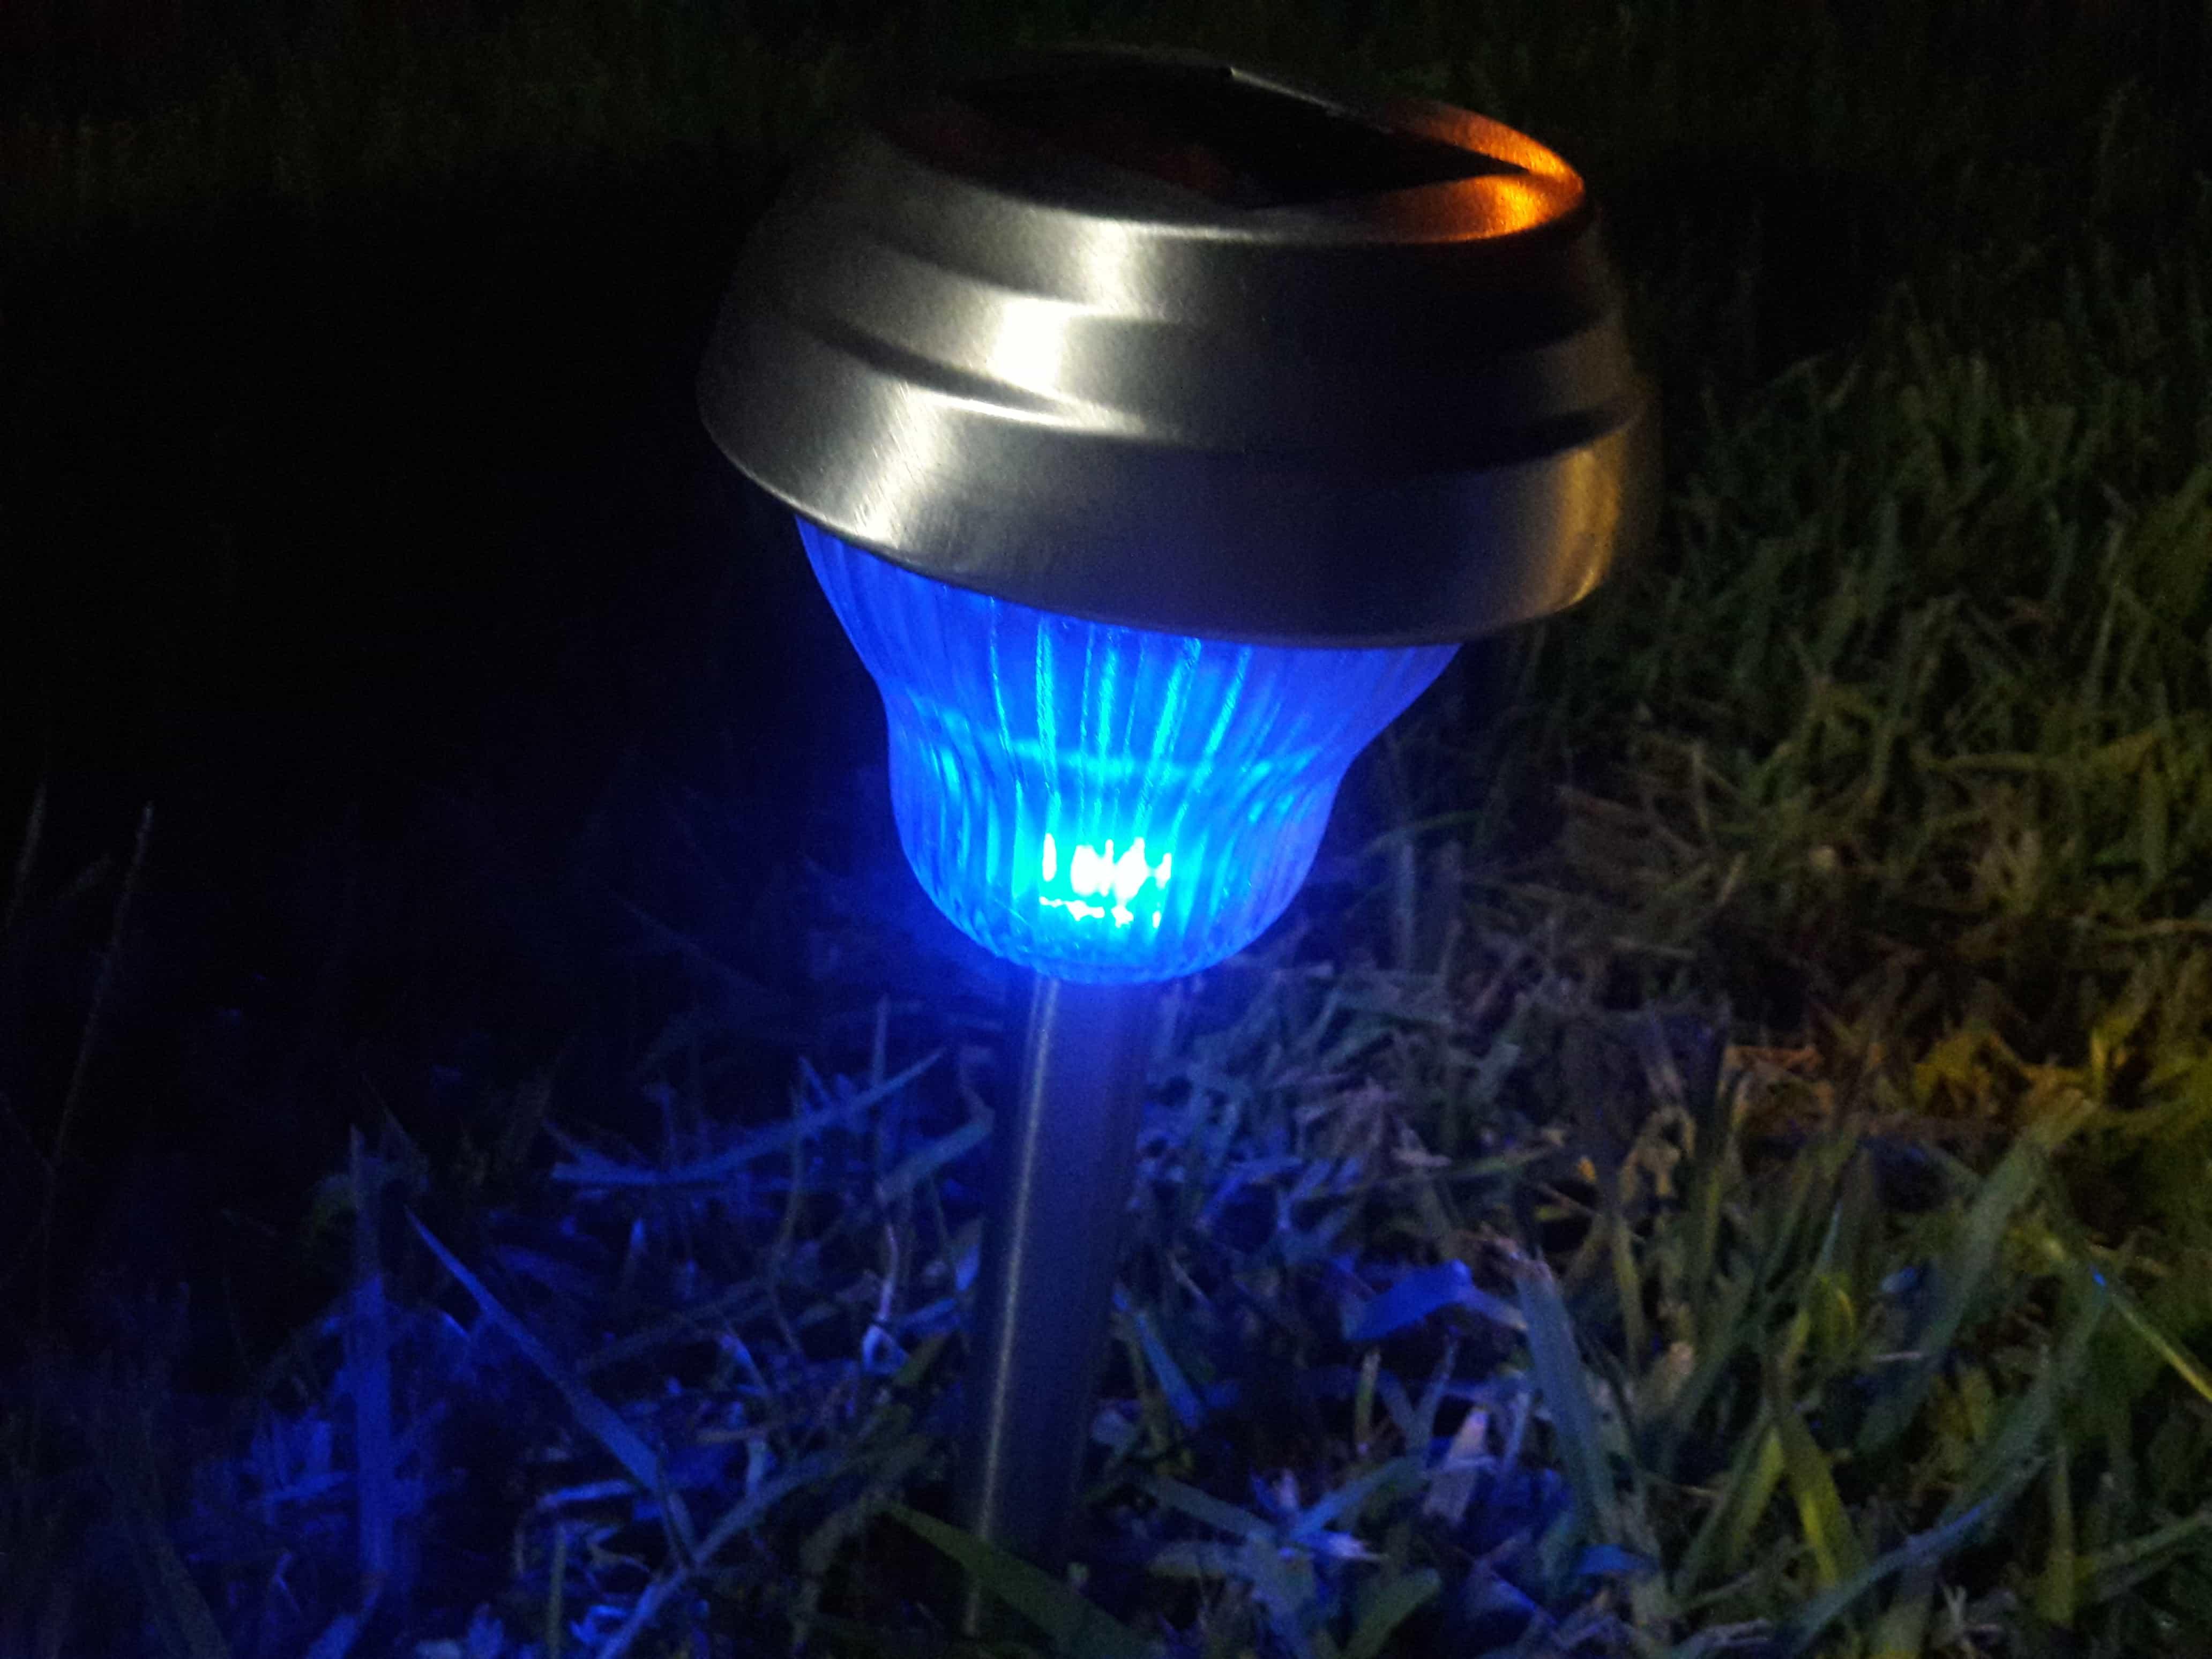 Sogrand Solar Lights Outdoor Pathway Decorative Garden Stake Light